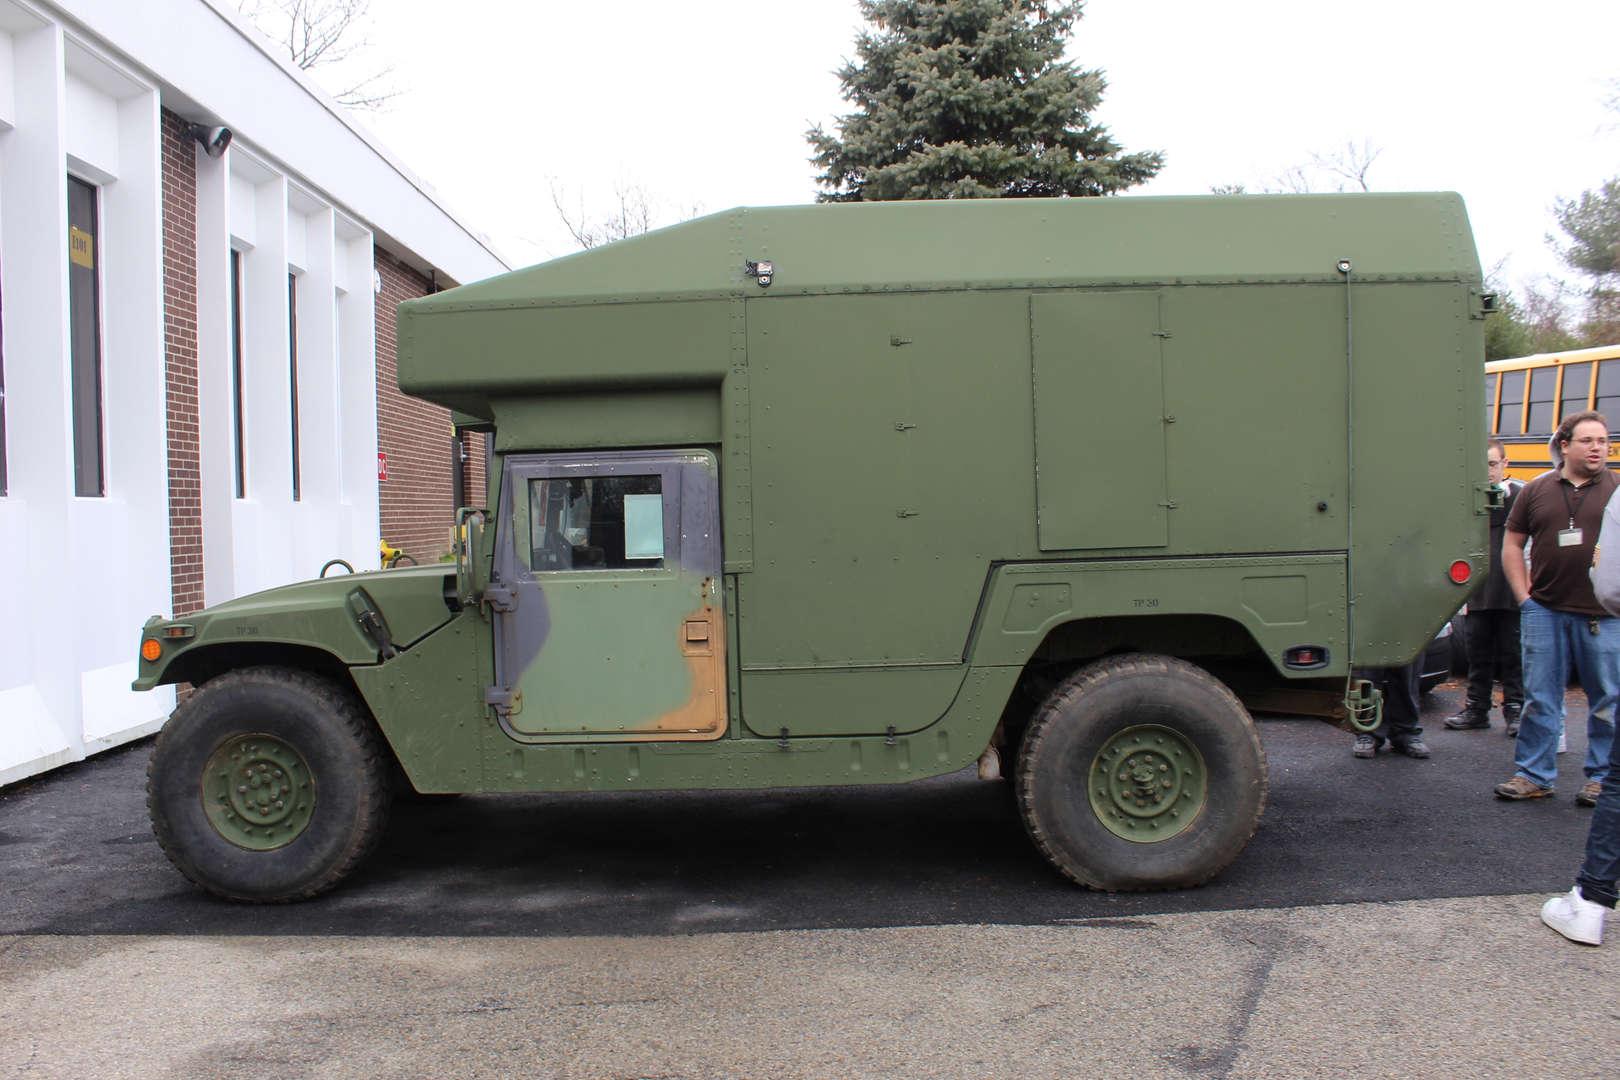 Military Humvee ambulance